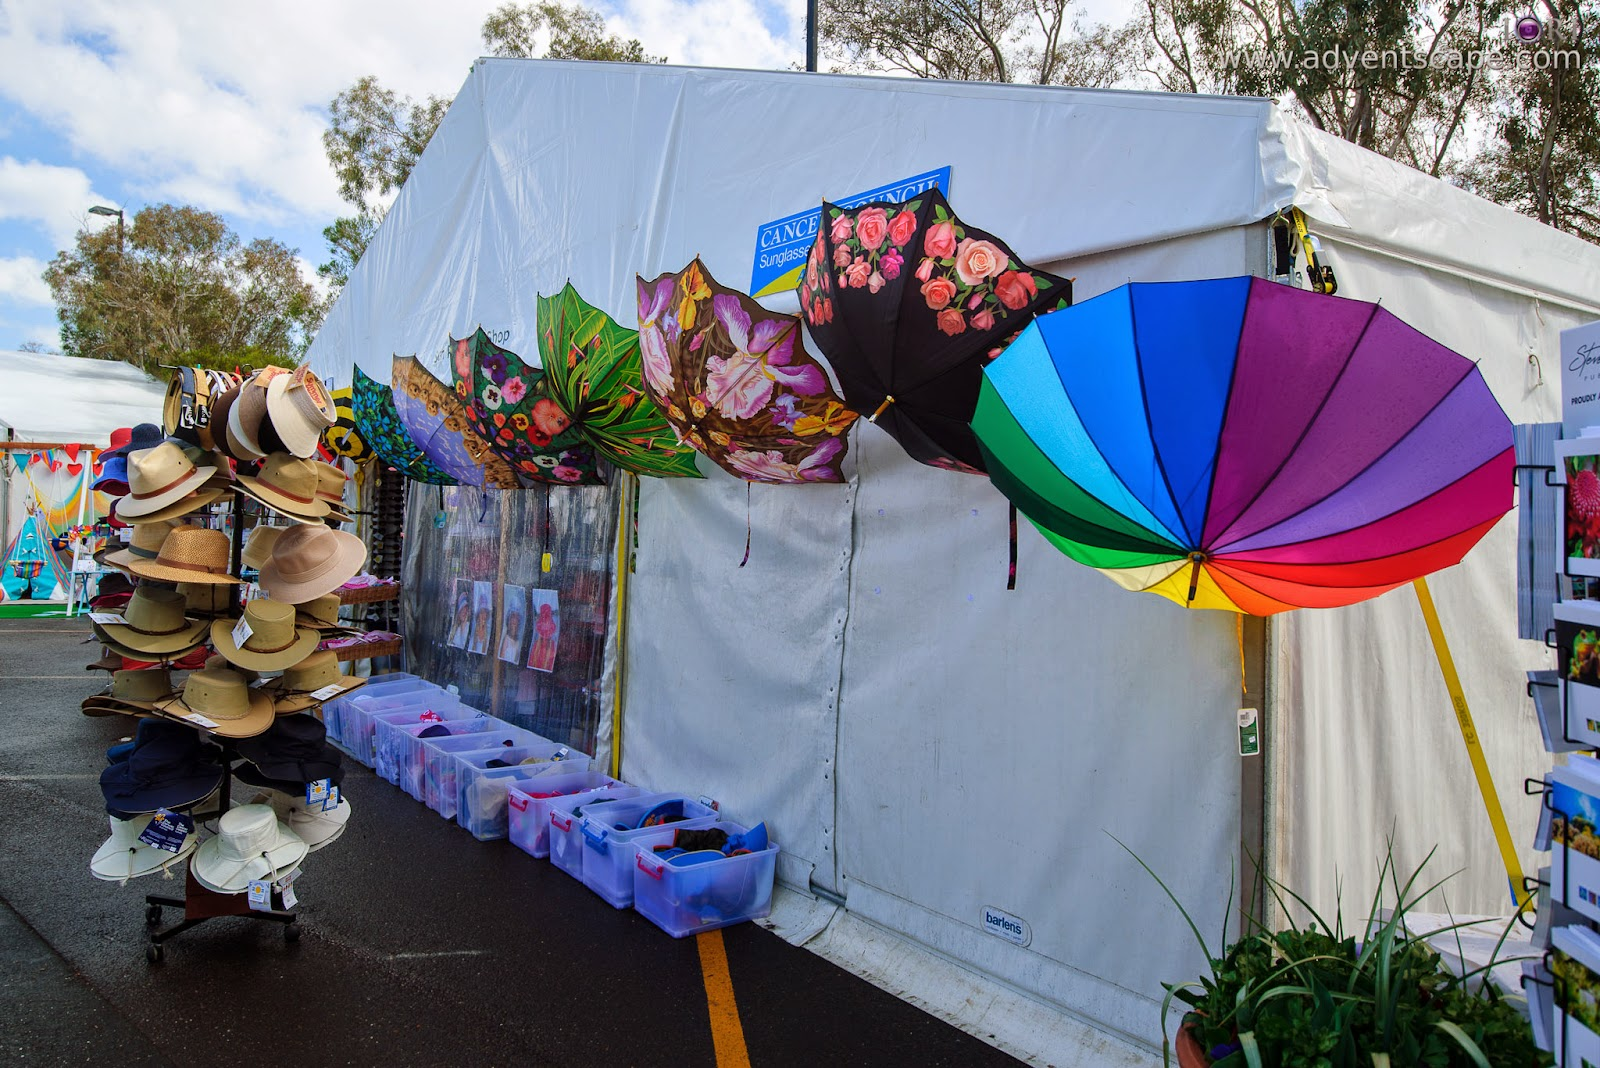 Philip Avellana, iori, advenscape, Floriade, 2014, spring festival, Canberra, ACT, Australian Capital Territory, park, flowers, blossom, merchant, umbrella